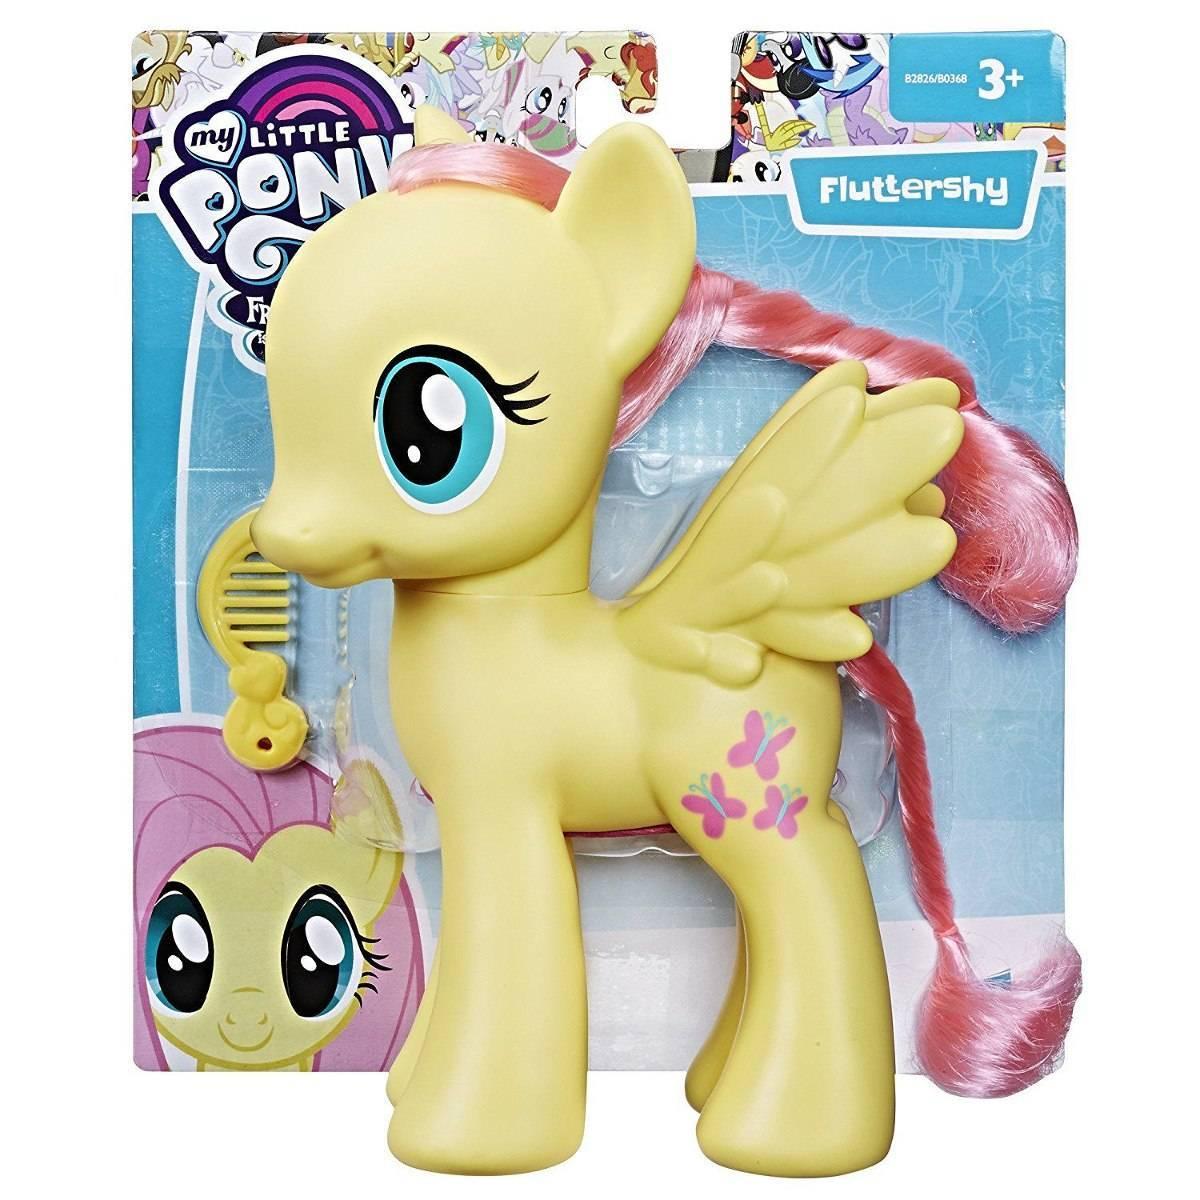 Fluttershy 20 cm My Little Pony - Hasbro B2826 - Noy Brinquedos